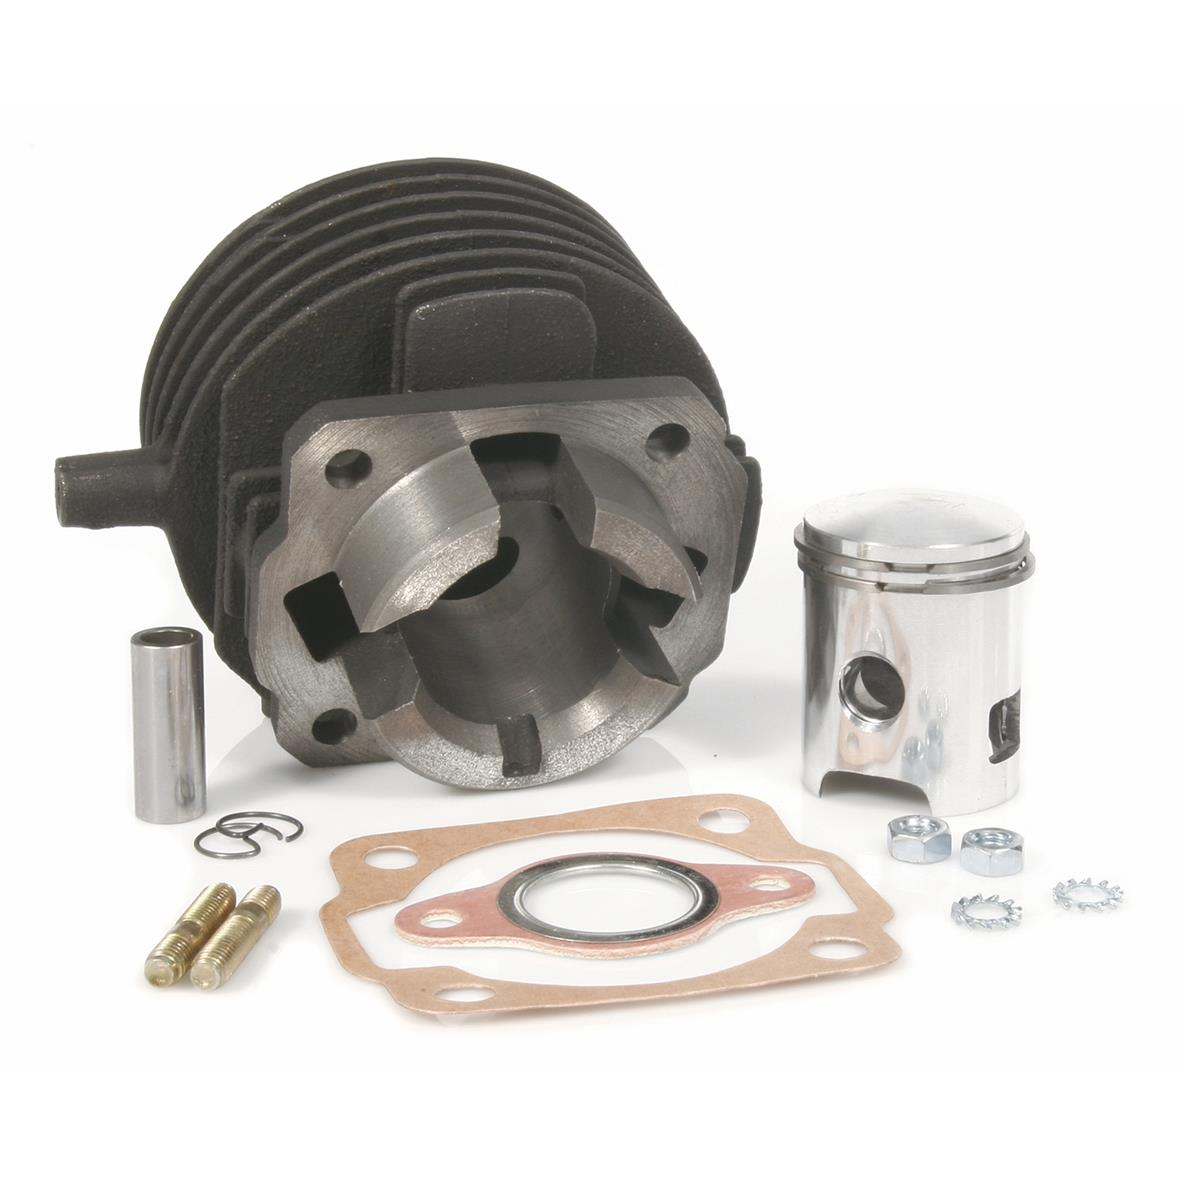 Productafbeelding voor 'Racing Cilinder D.R. by SIP 50 ccTitle'